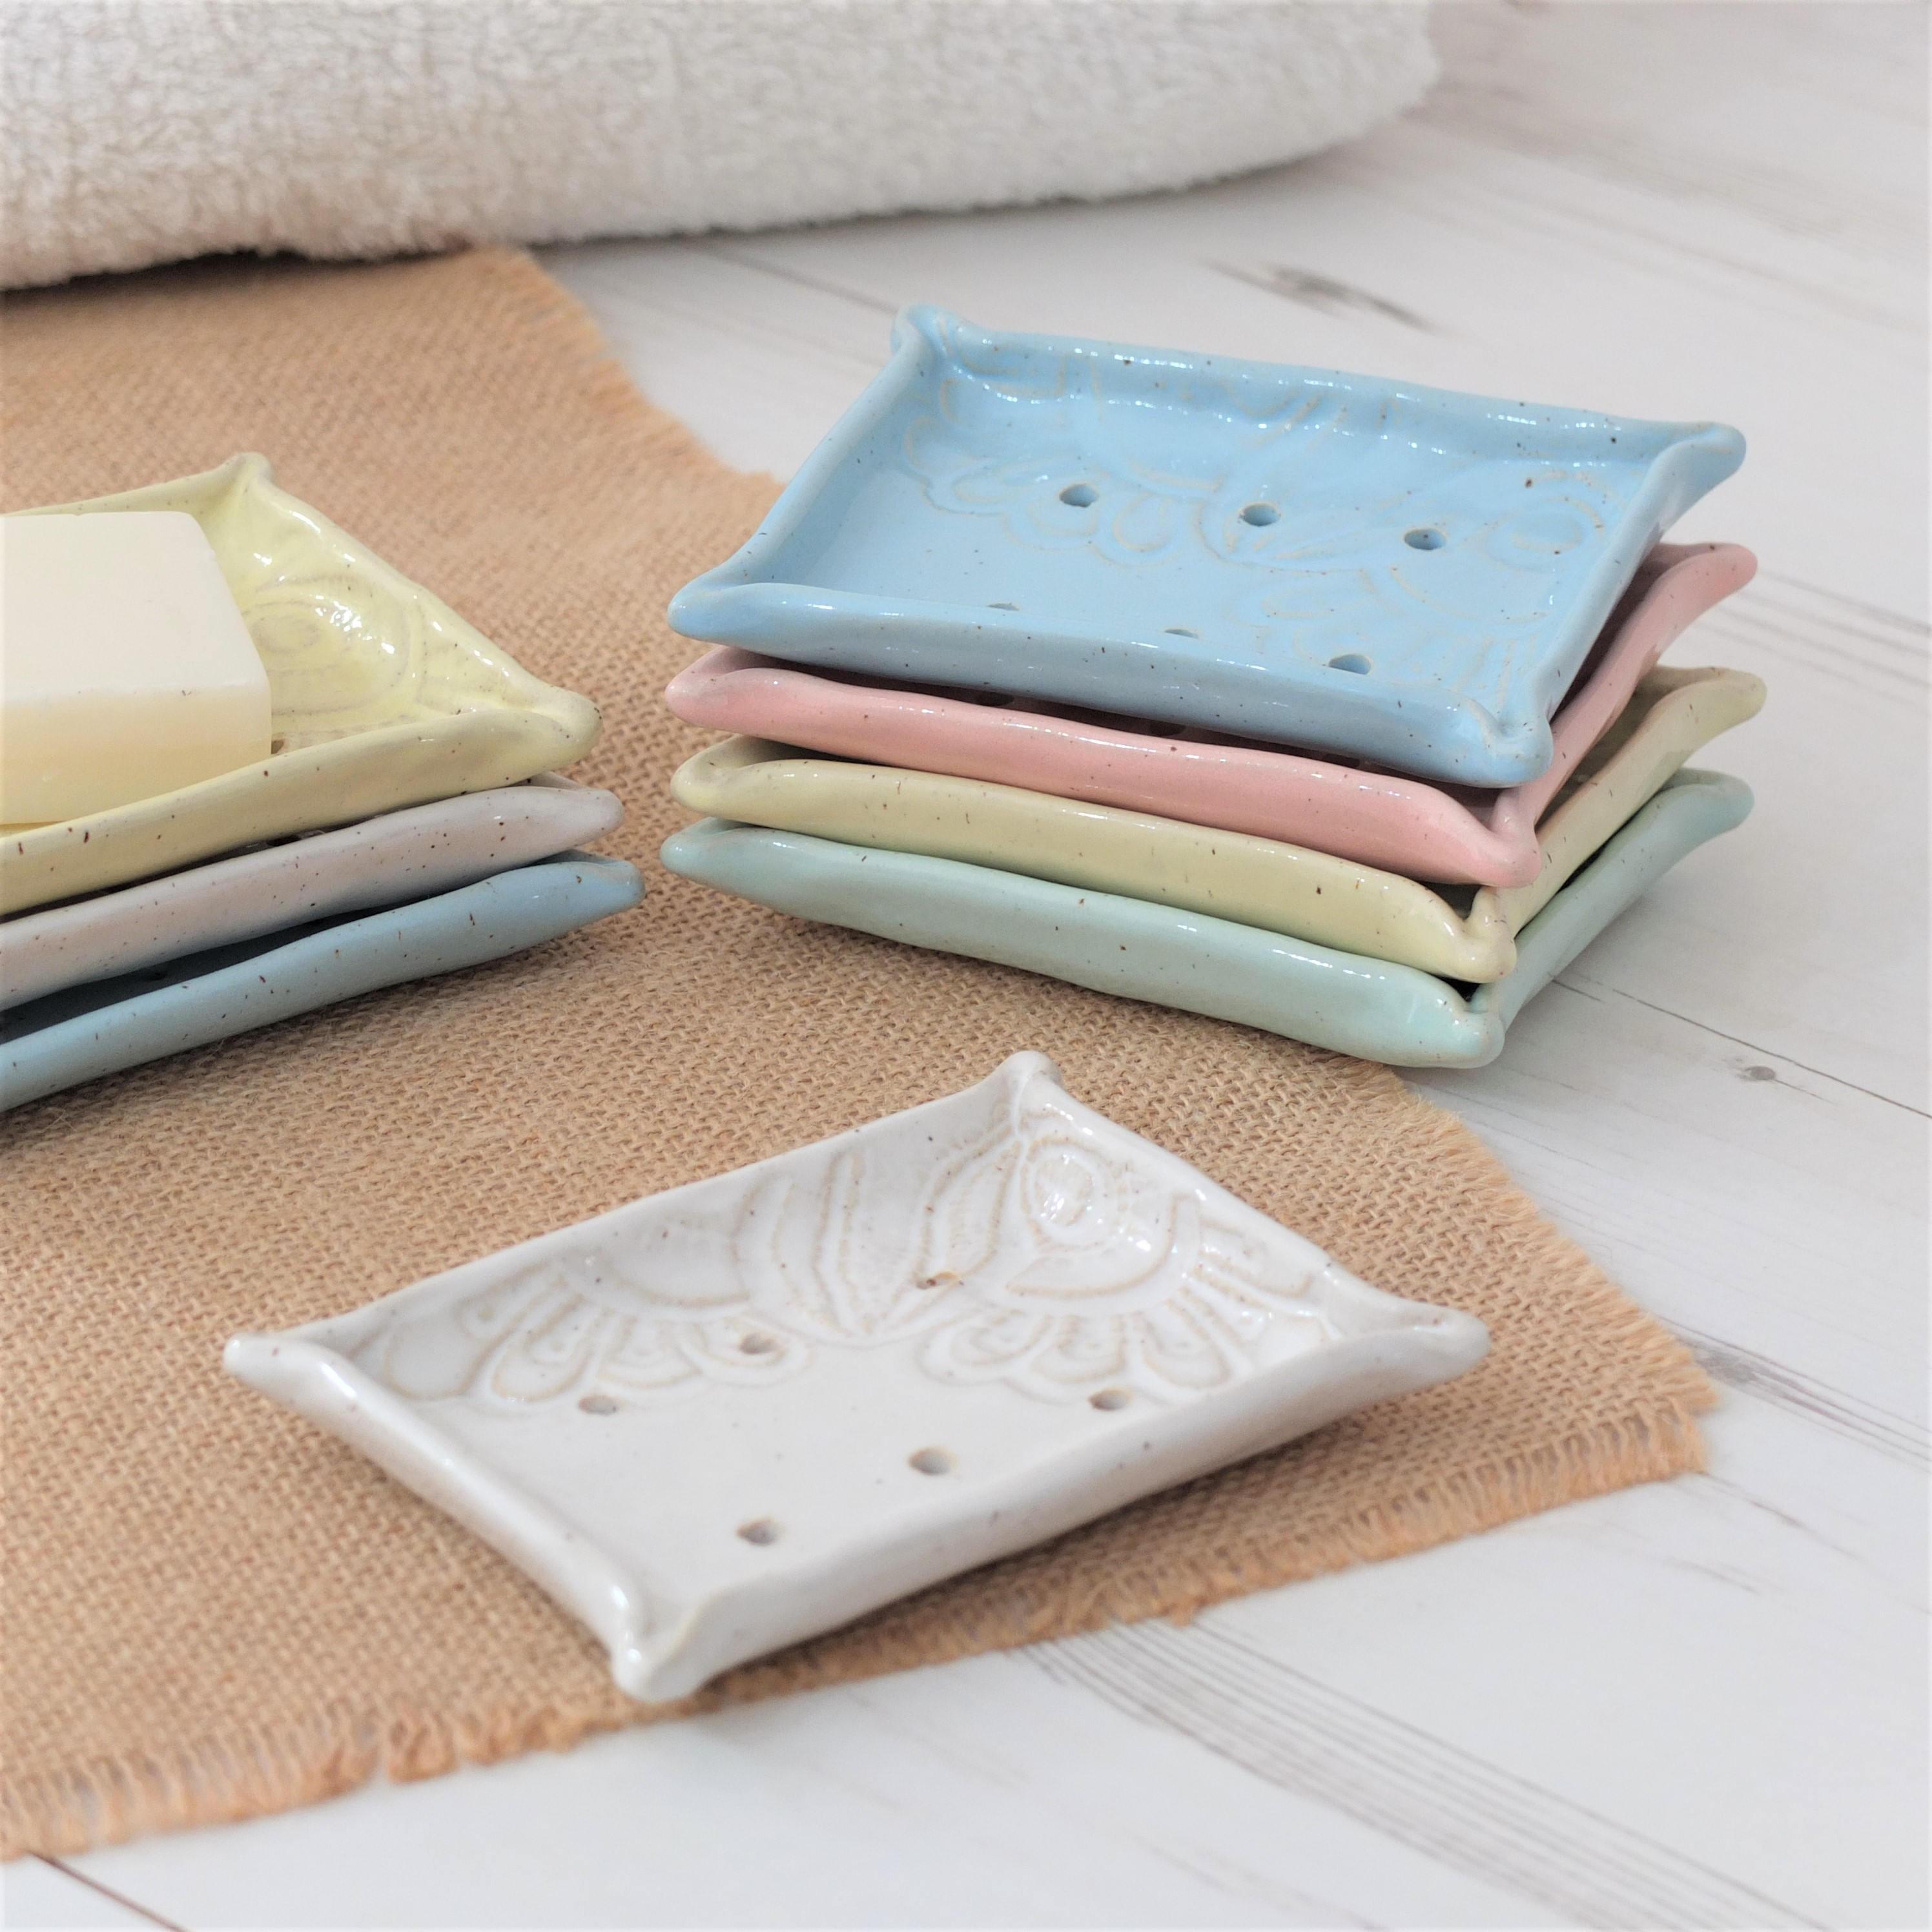 Handmade ceramic soap dish vintage lace pastels bathroom - Ceramic soap dishes for bathrooms ...